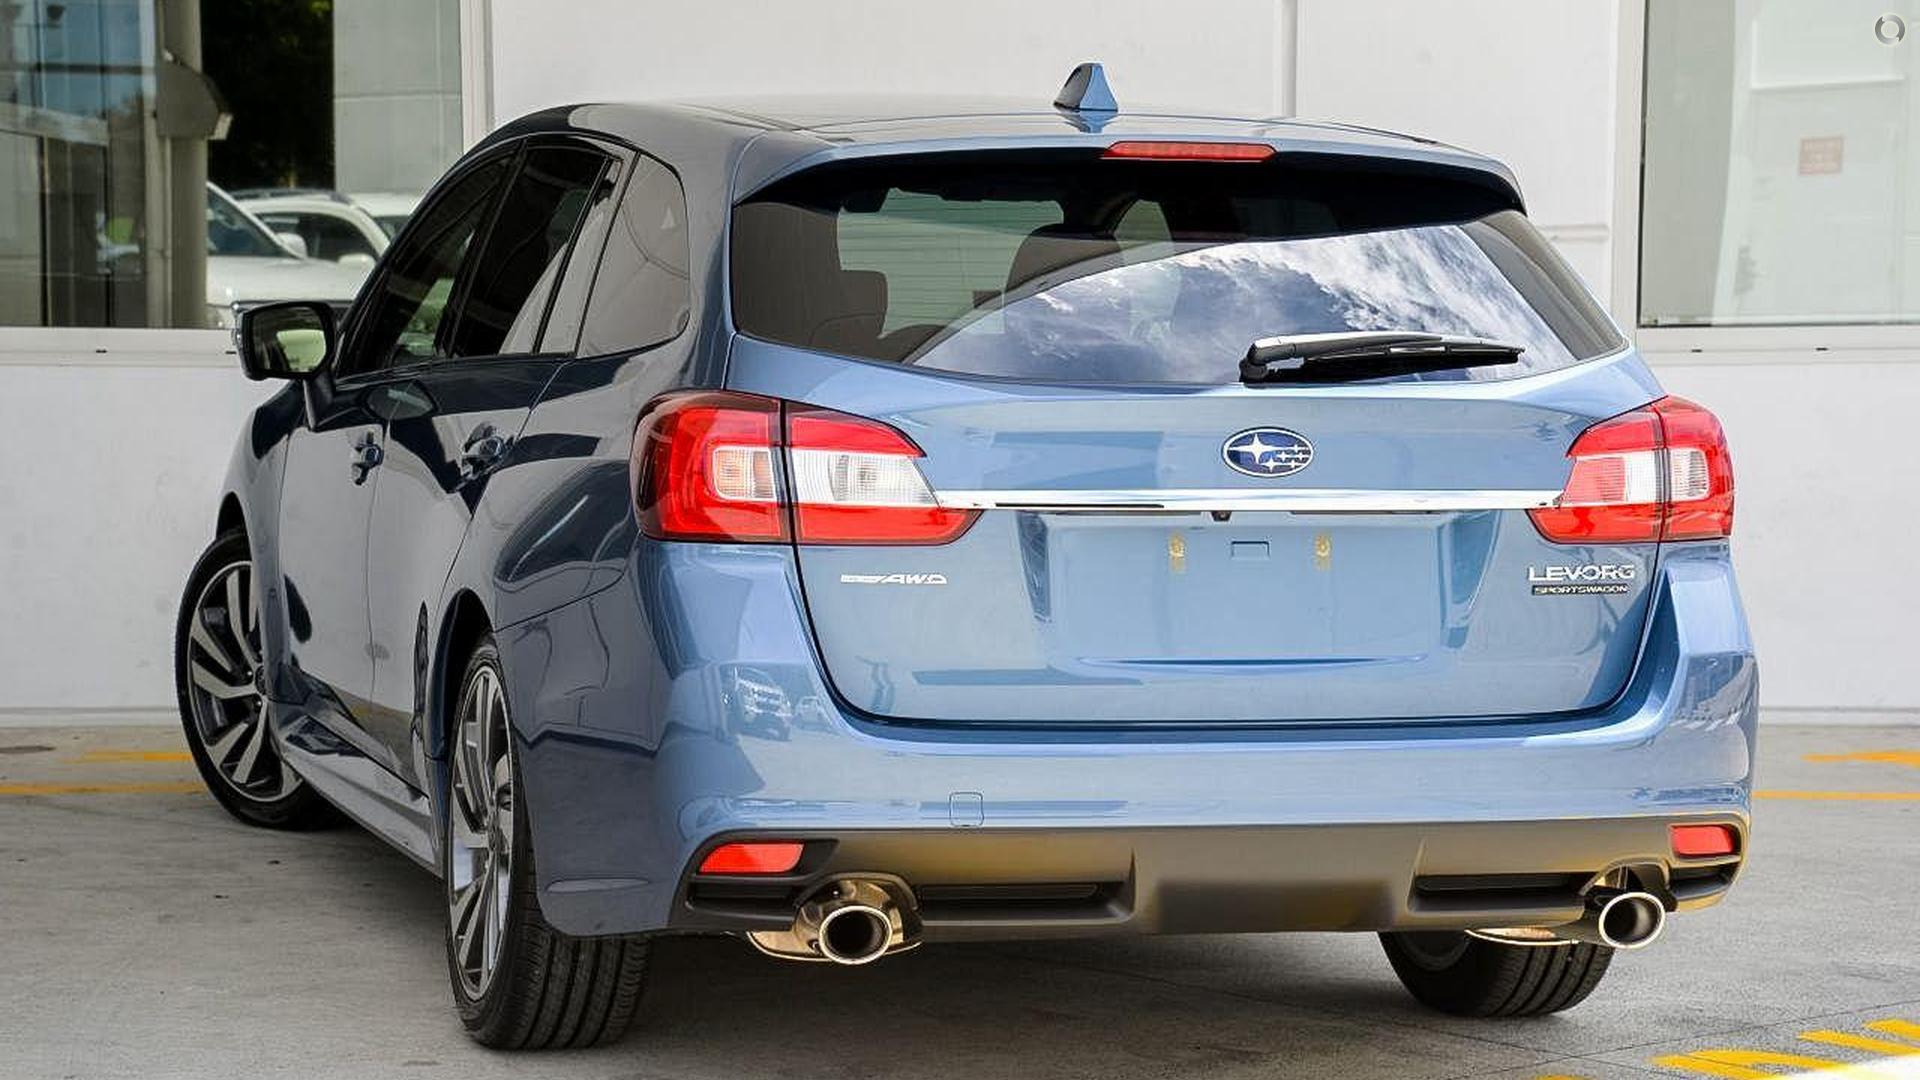 2017 Subaru Levorg 1.6 GT Premium V1